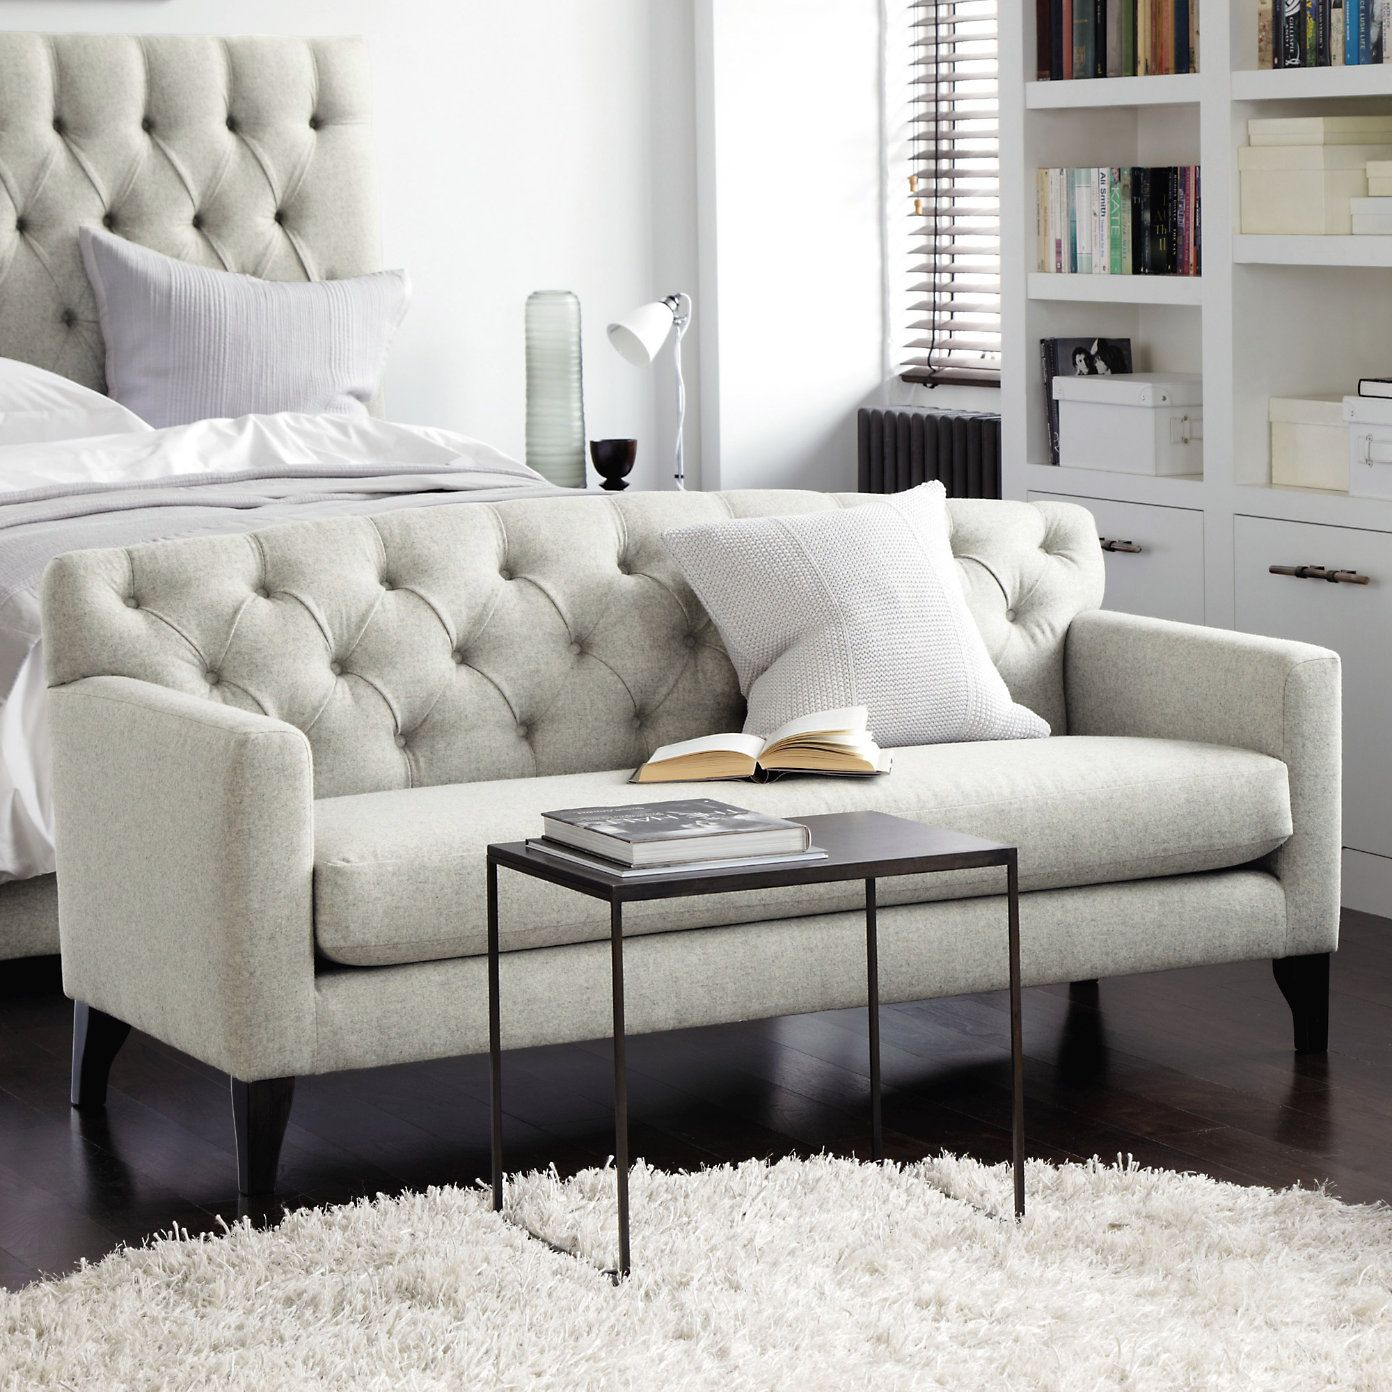 Eaton Bedroom Sofa - Seating